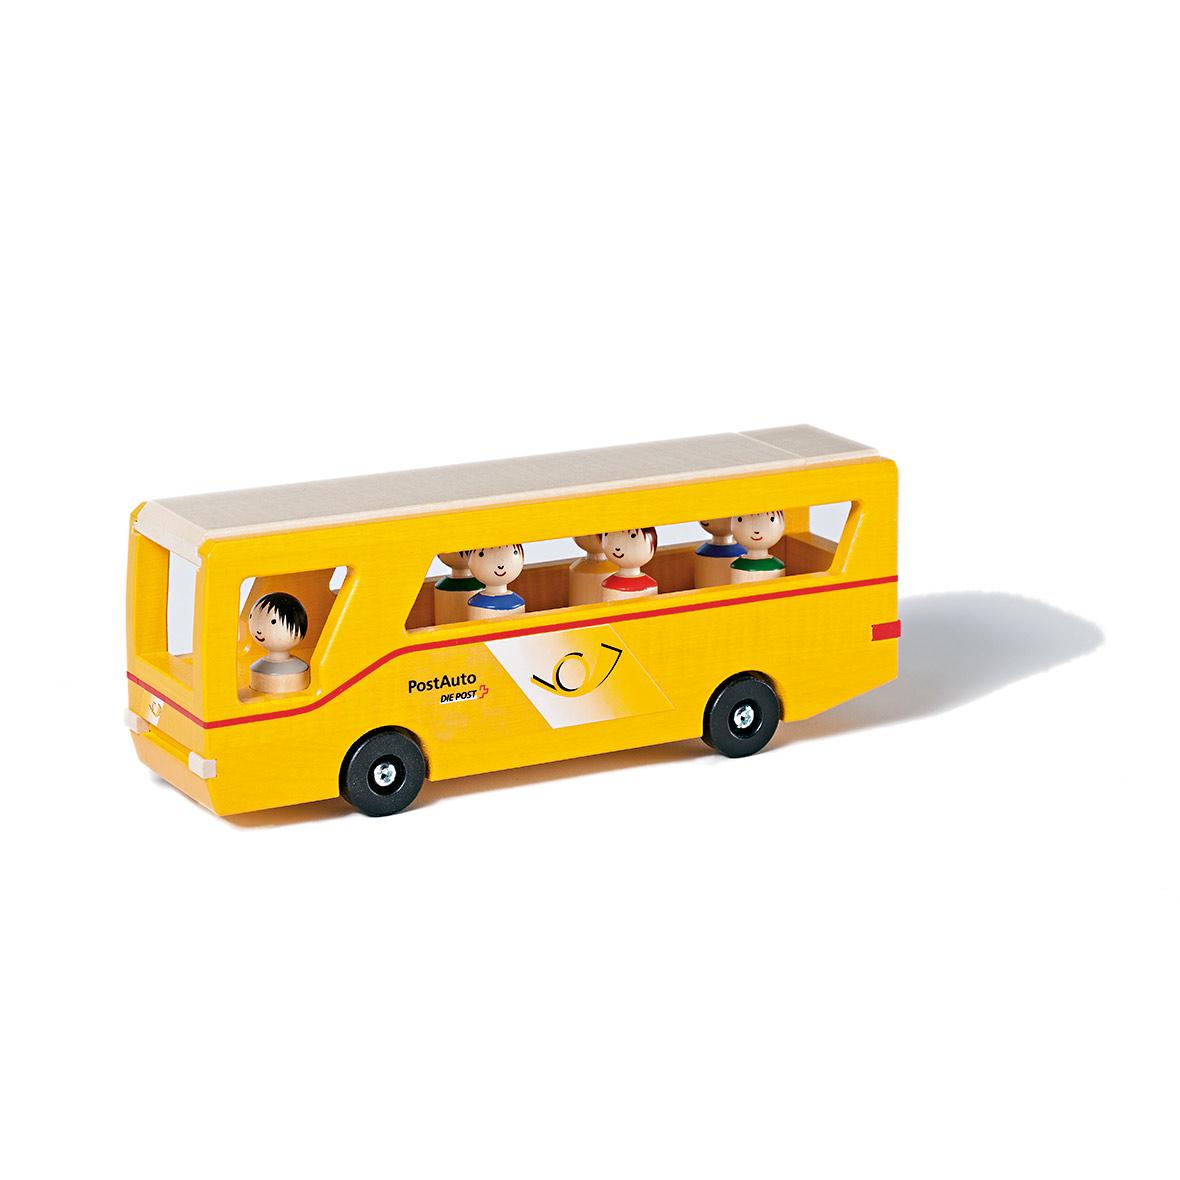 Kinderspielzeug Postauto mit Figuren, Holz